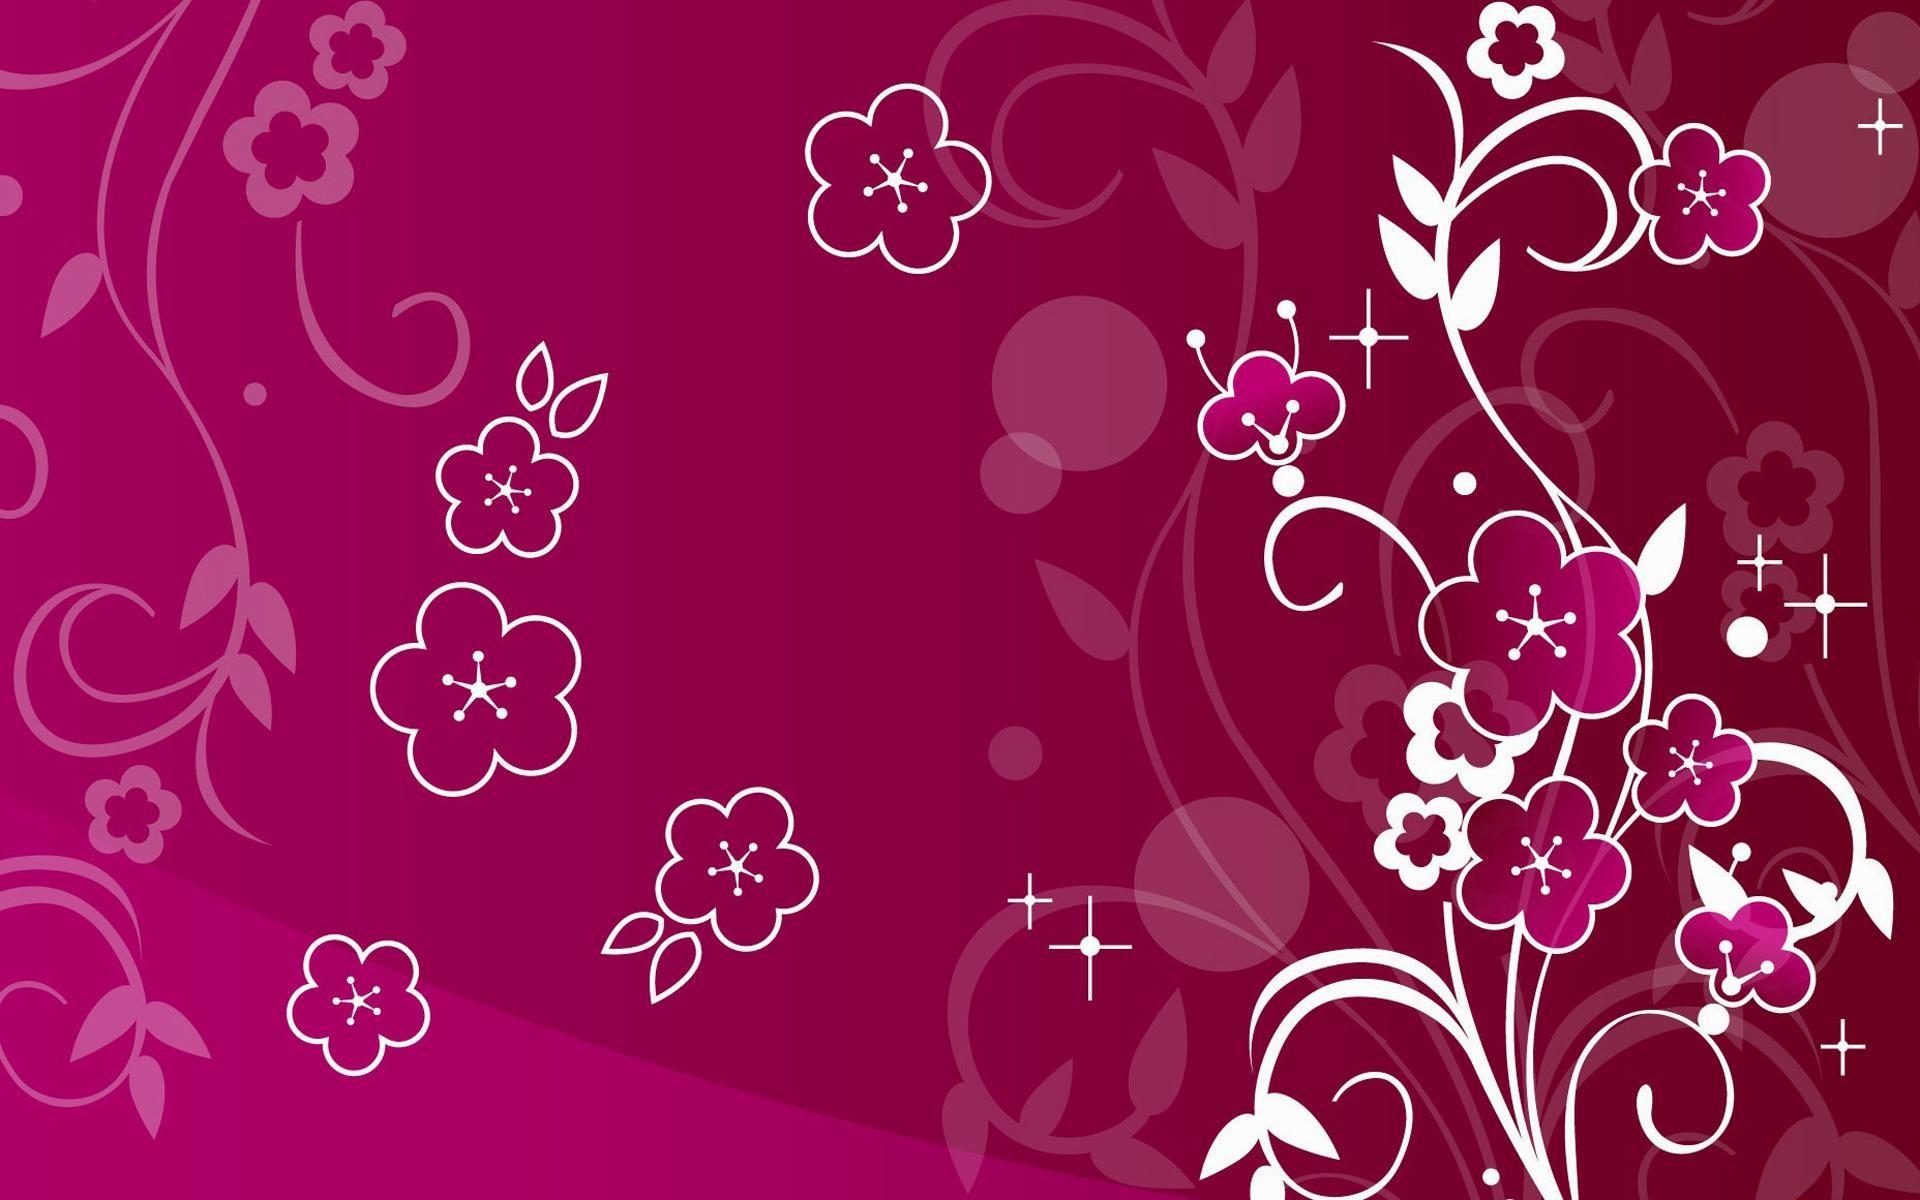 Cool-Pink-Iphone-Photos-HD